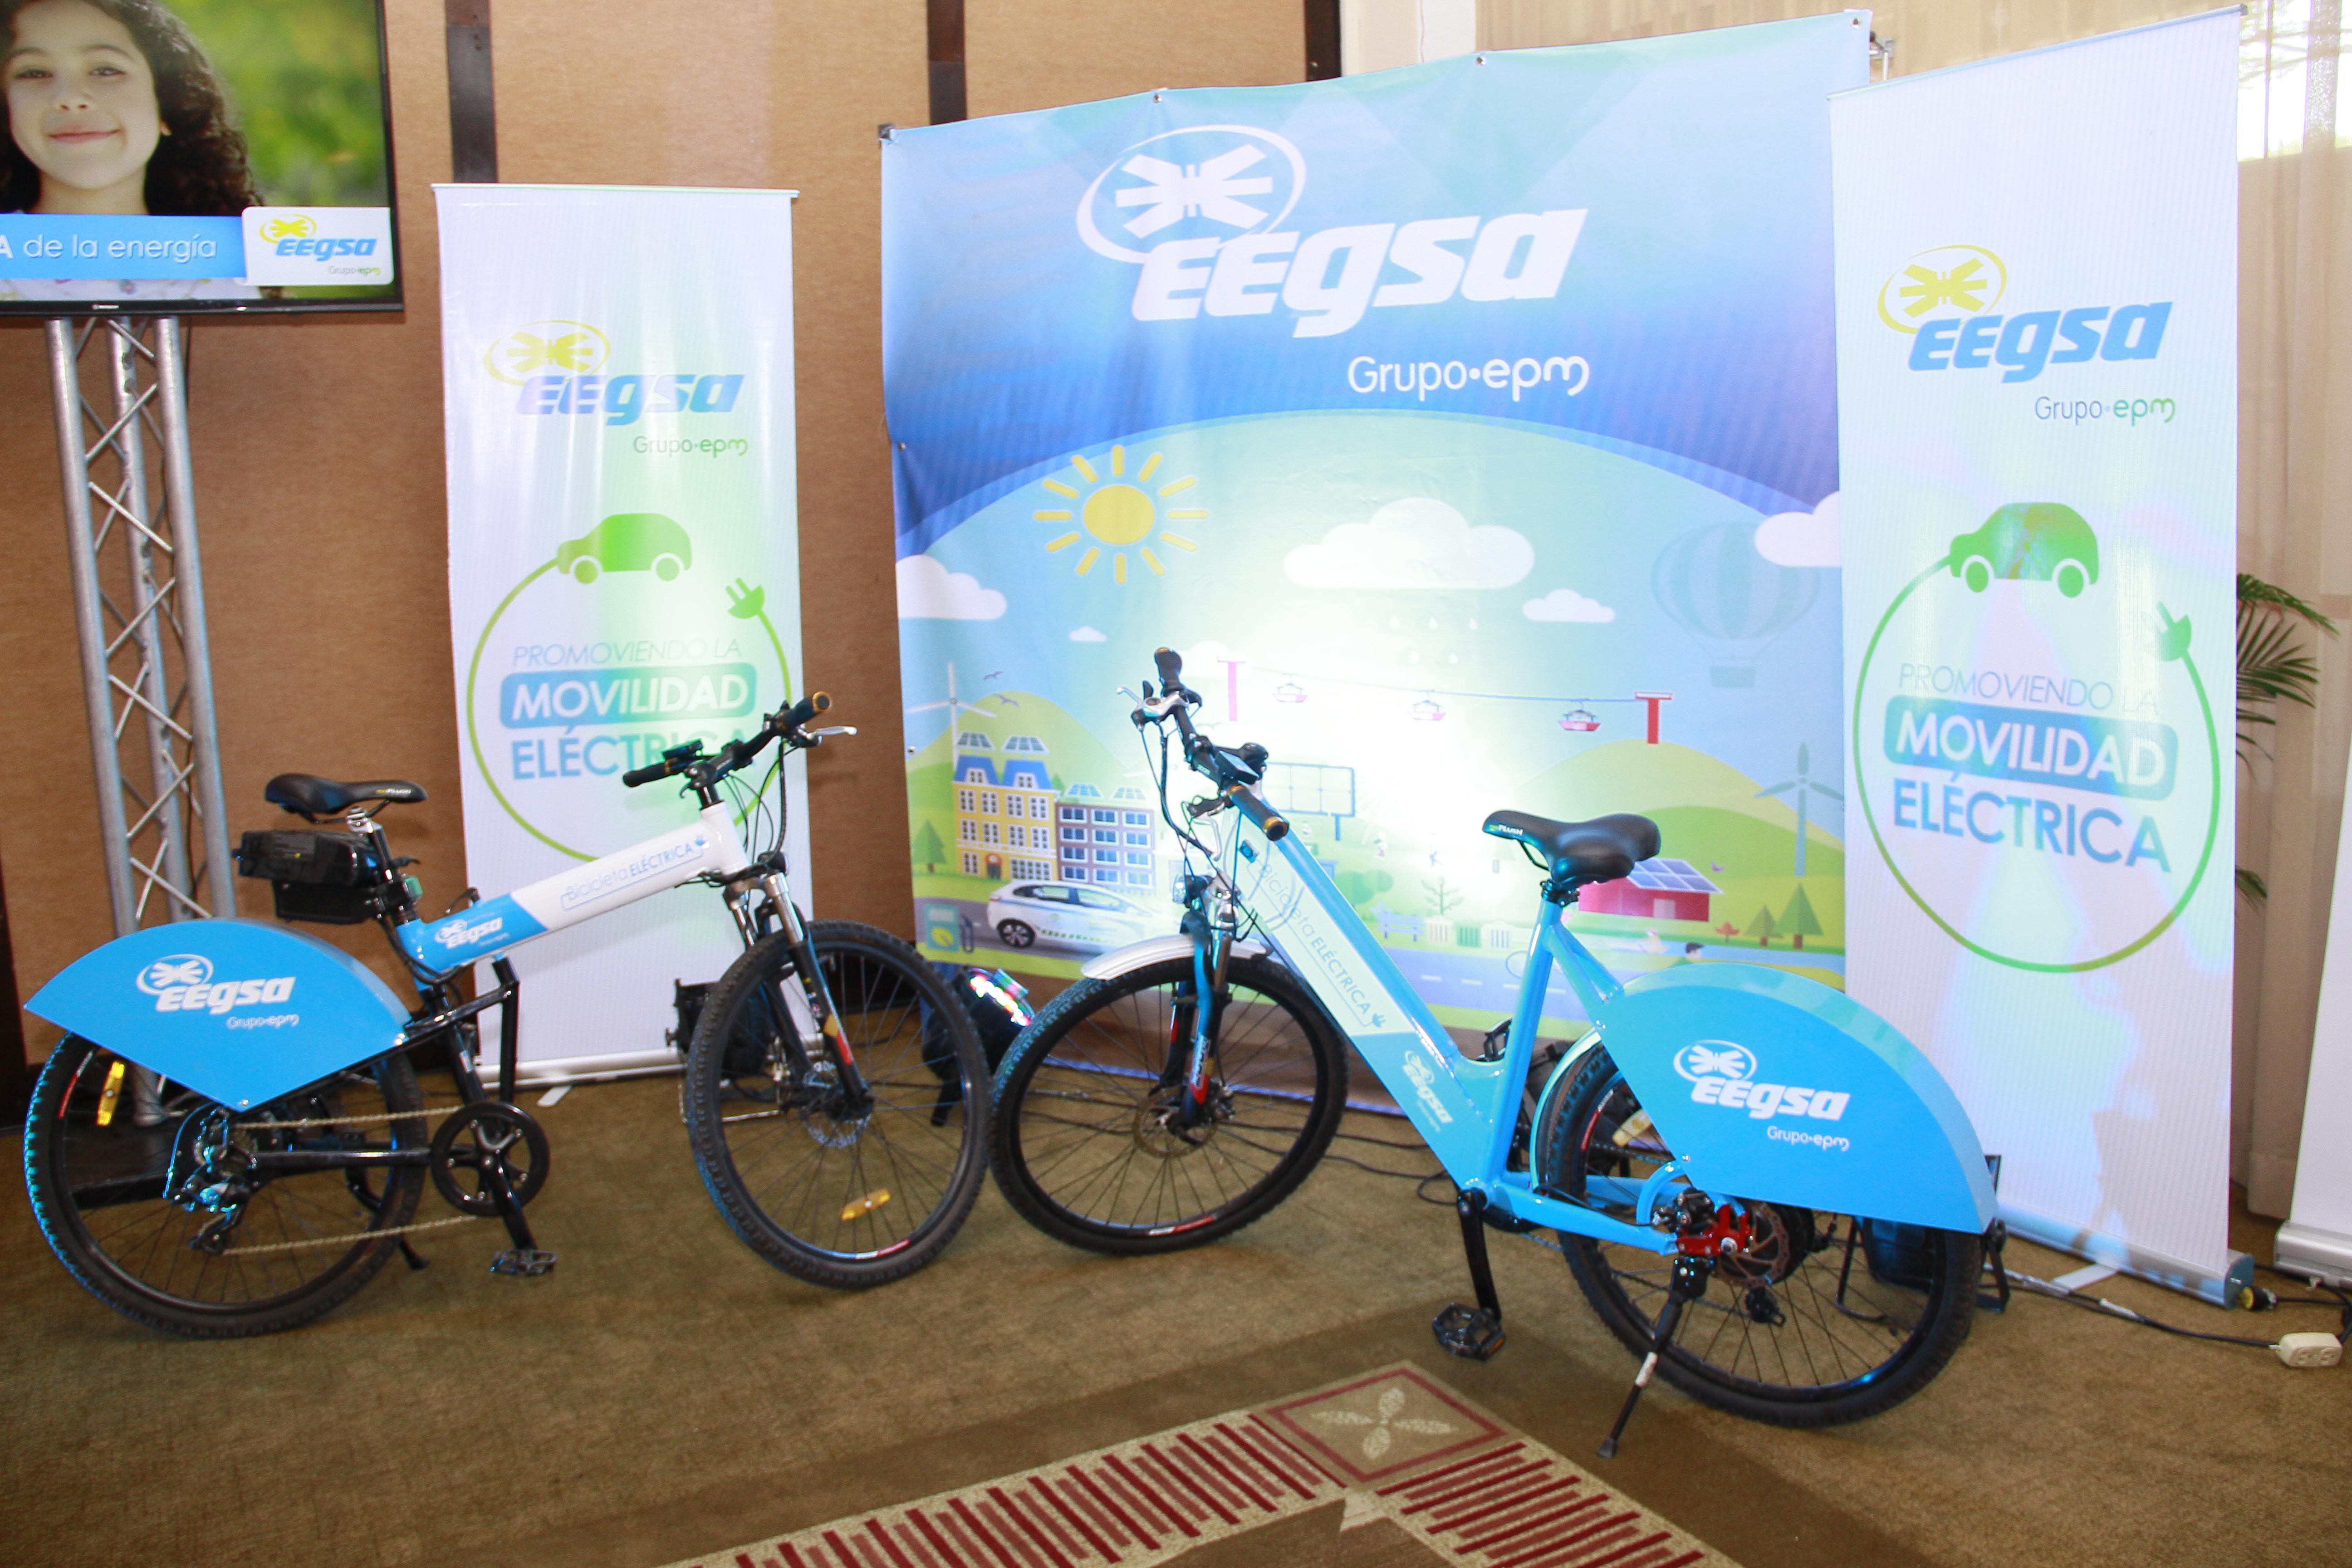 https://eegsa.com/wp-content/uploads/2019/06/bicicletas.jpg